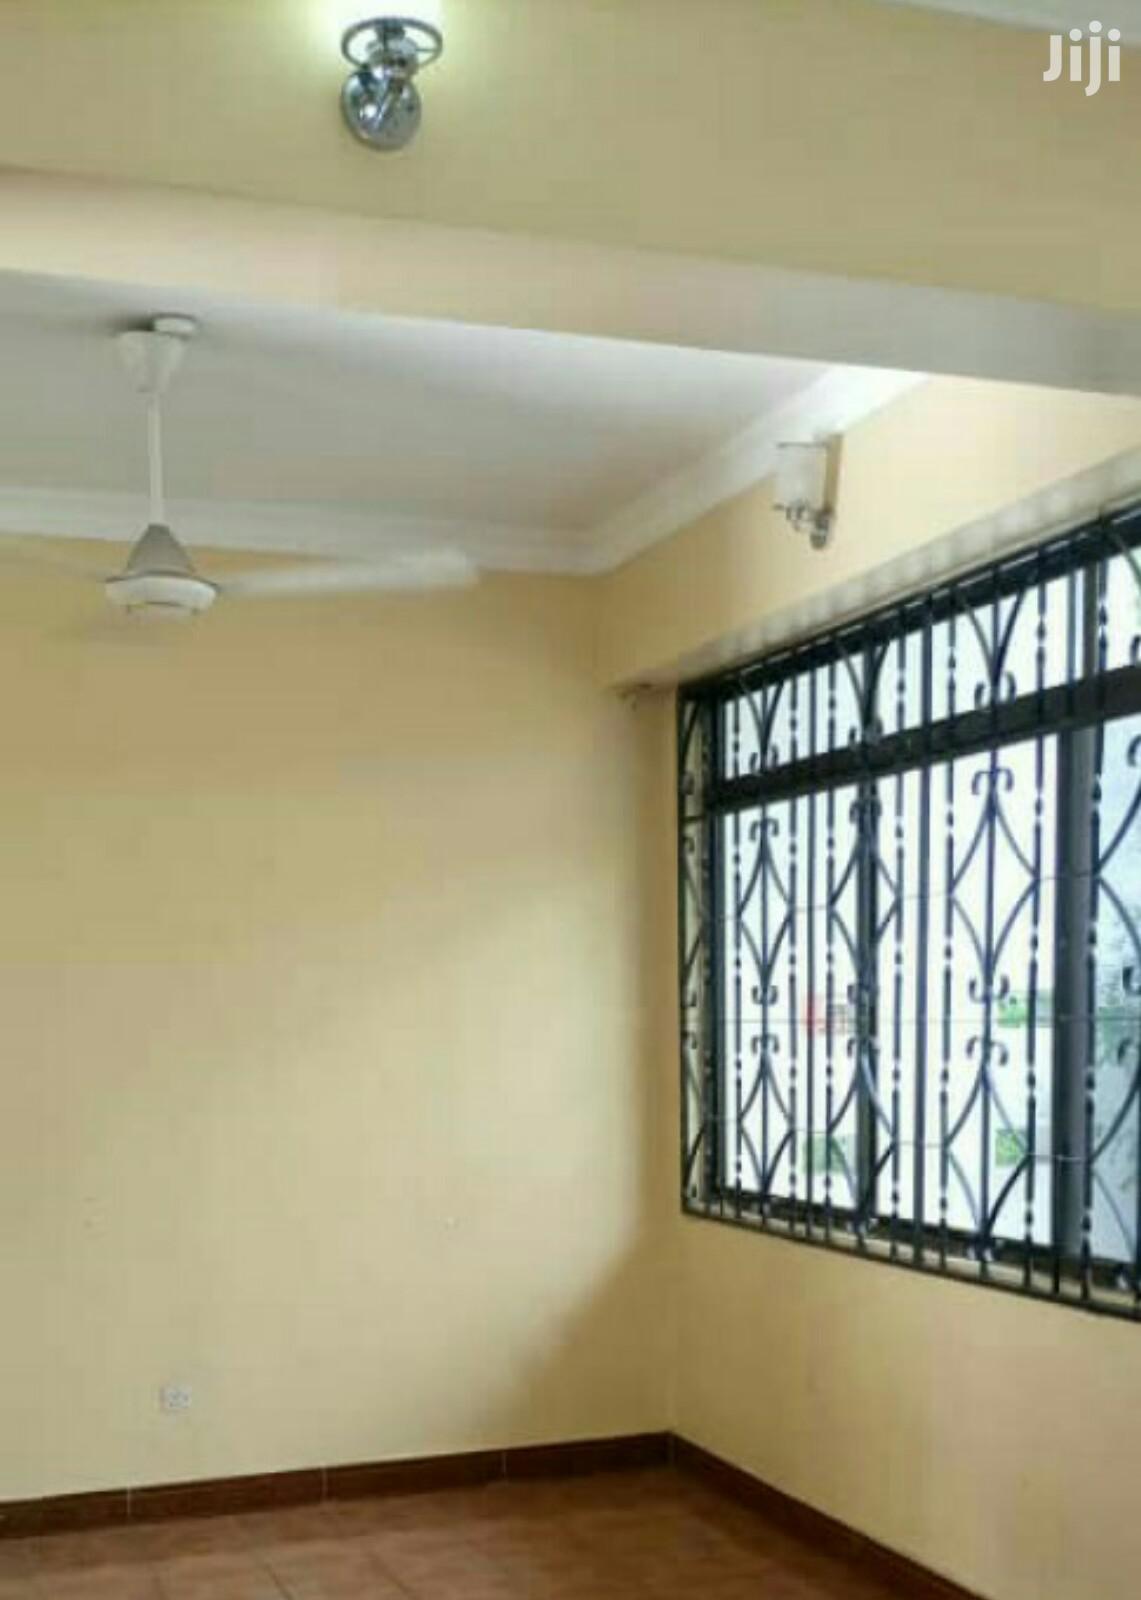 1 Storey 2 Bedrooms Apartment Inapangishwa, Ilala   Houses & Apartments For Rent for sale in Ilala, Ilala, Tanzania